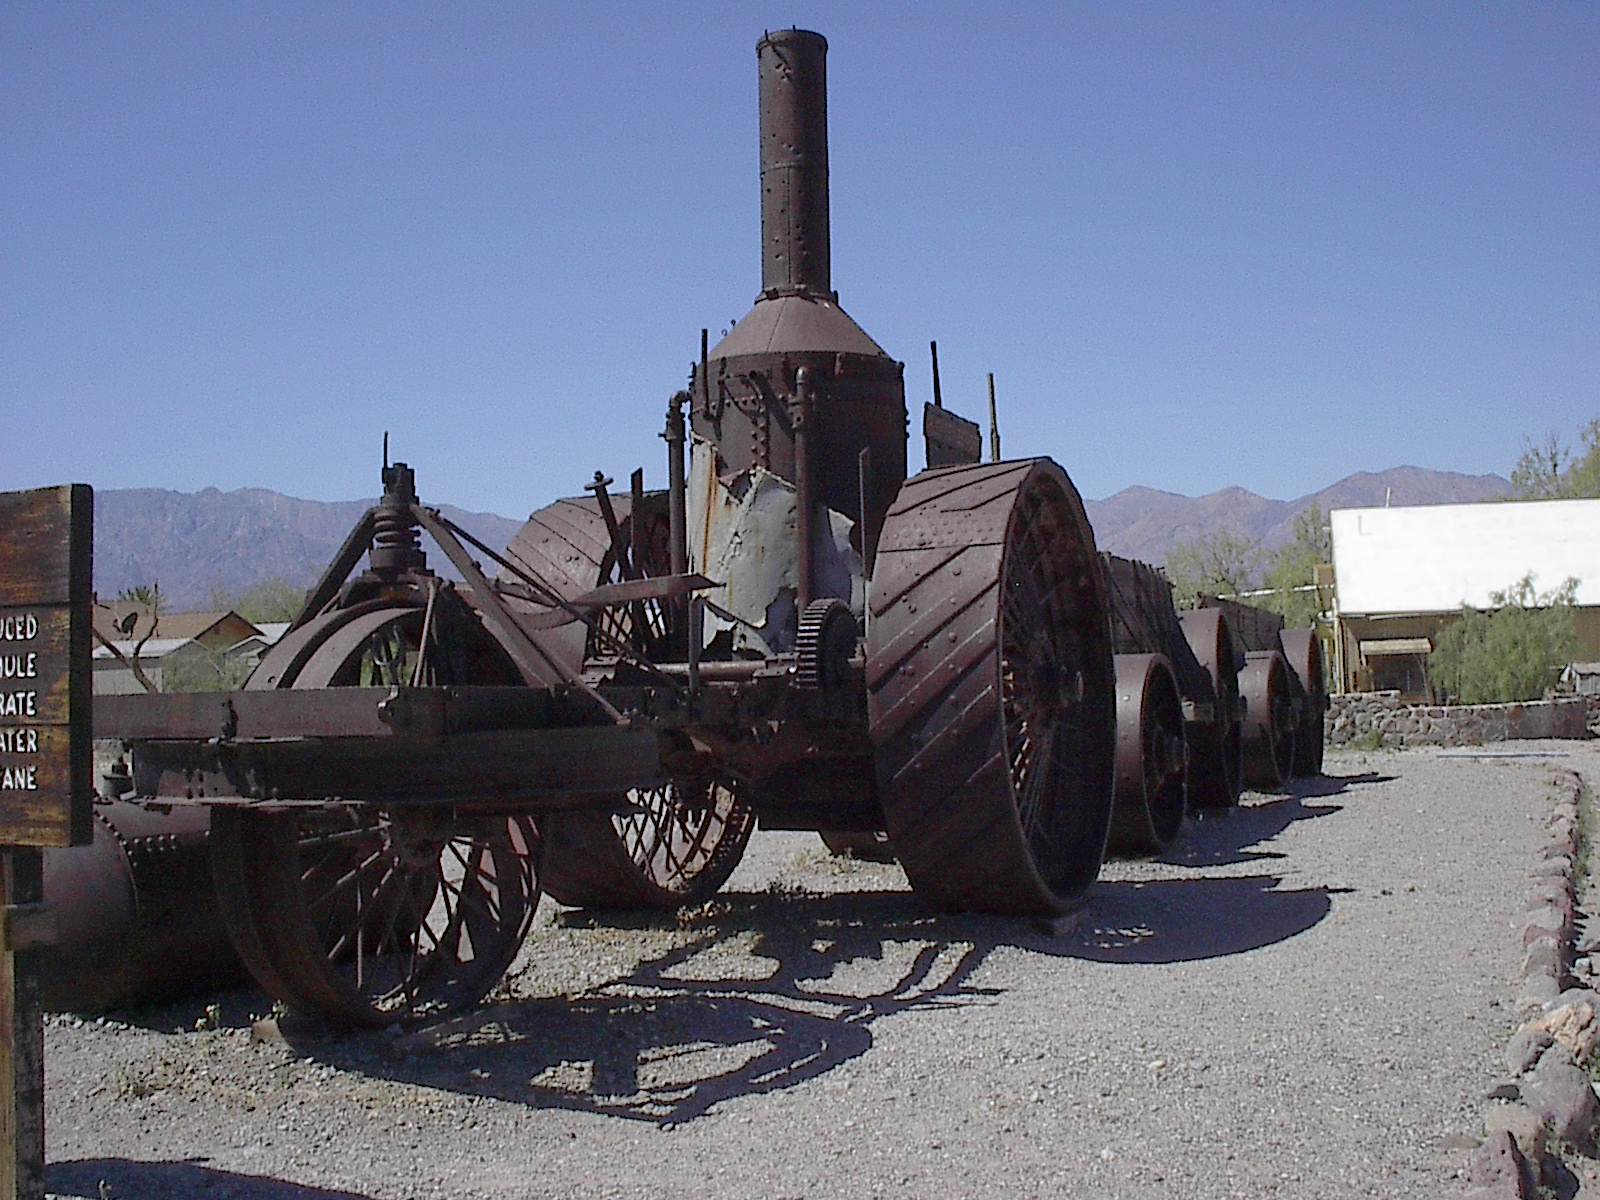 Borax Tractor